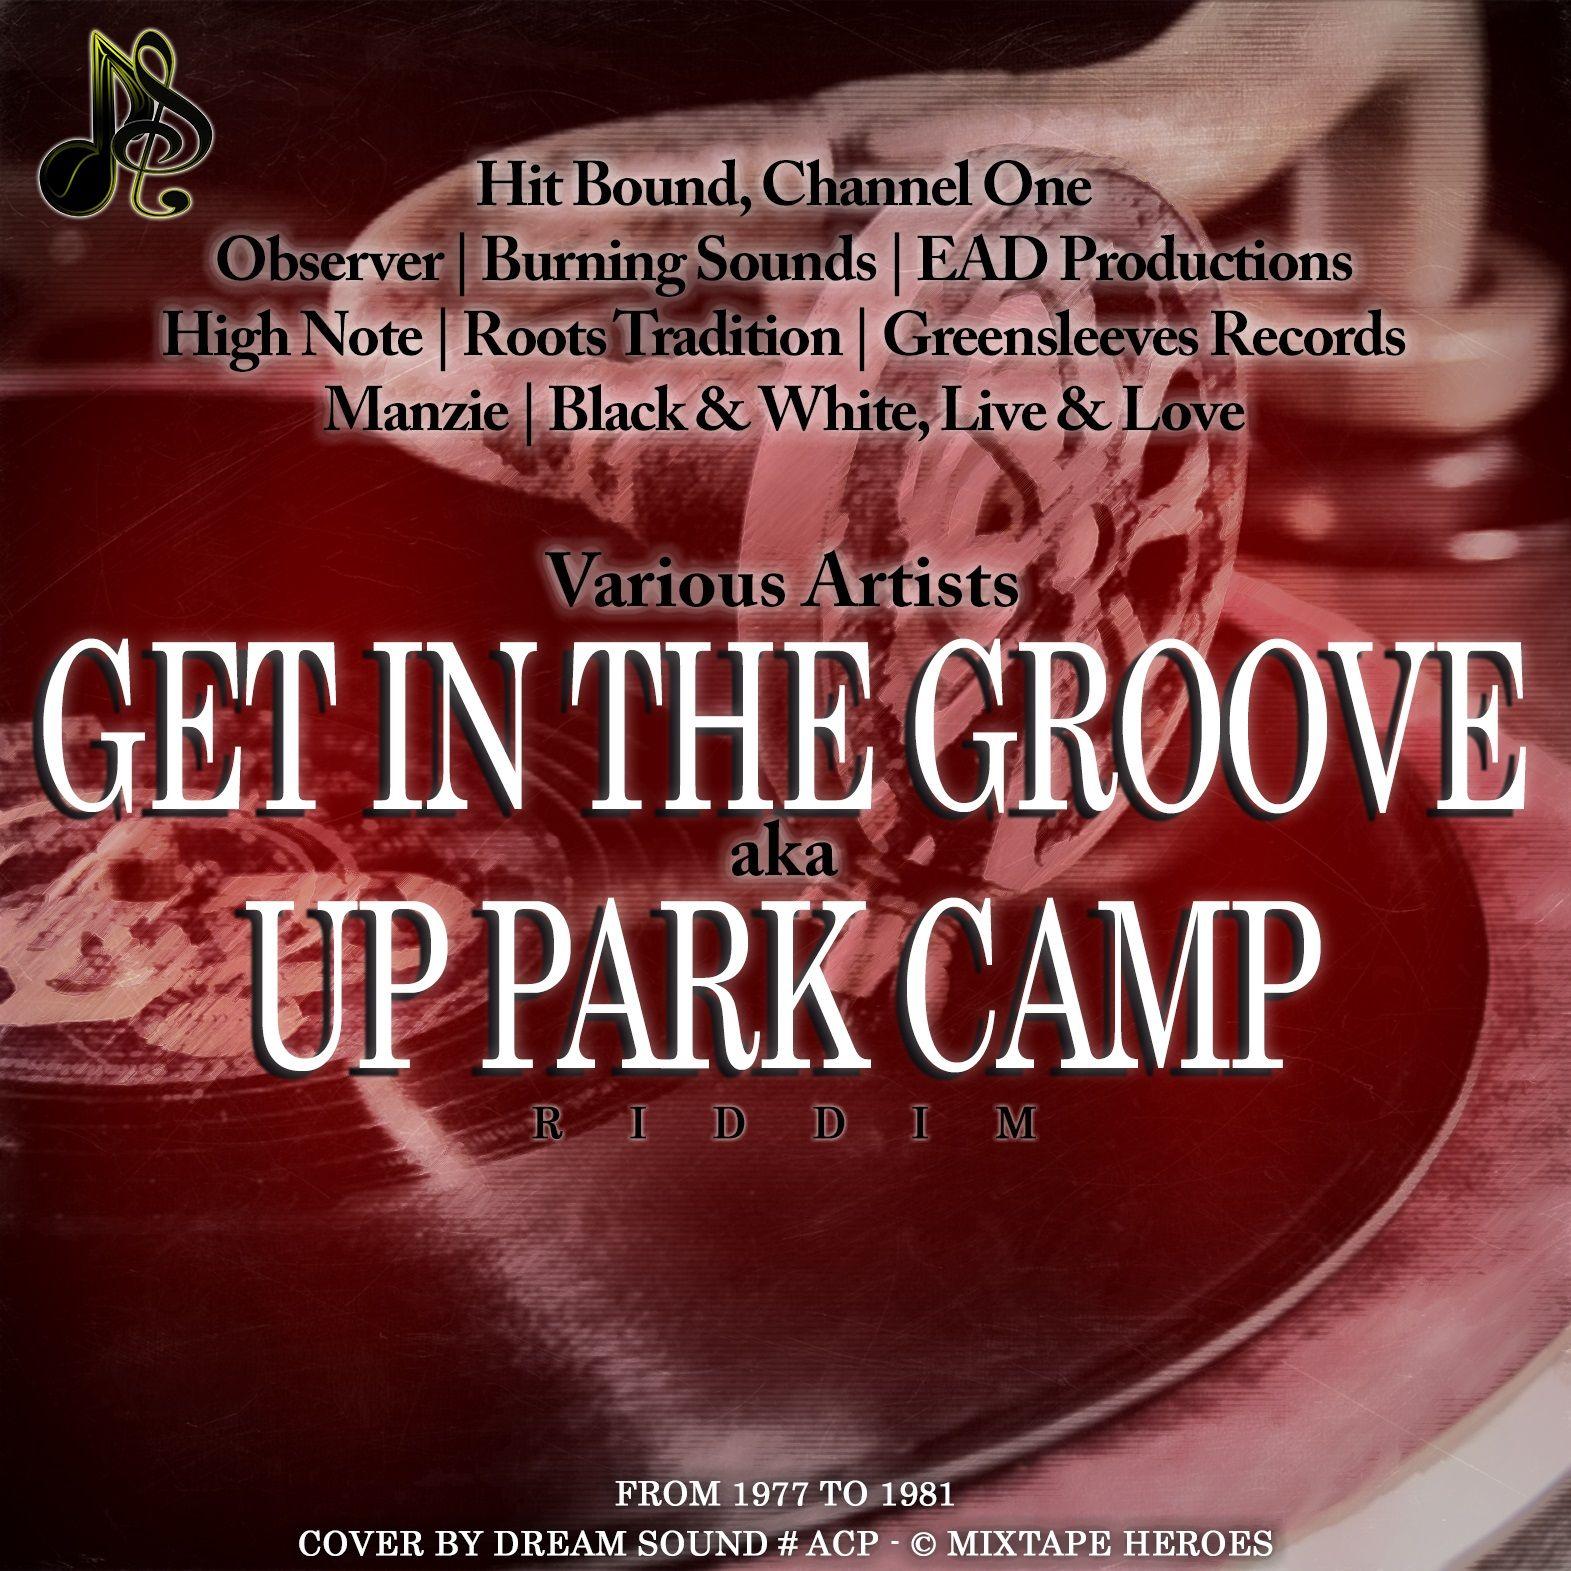 Get In The Groove Riddim aka Up Park Camp Riddim - 1977-1981